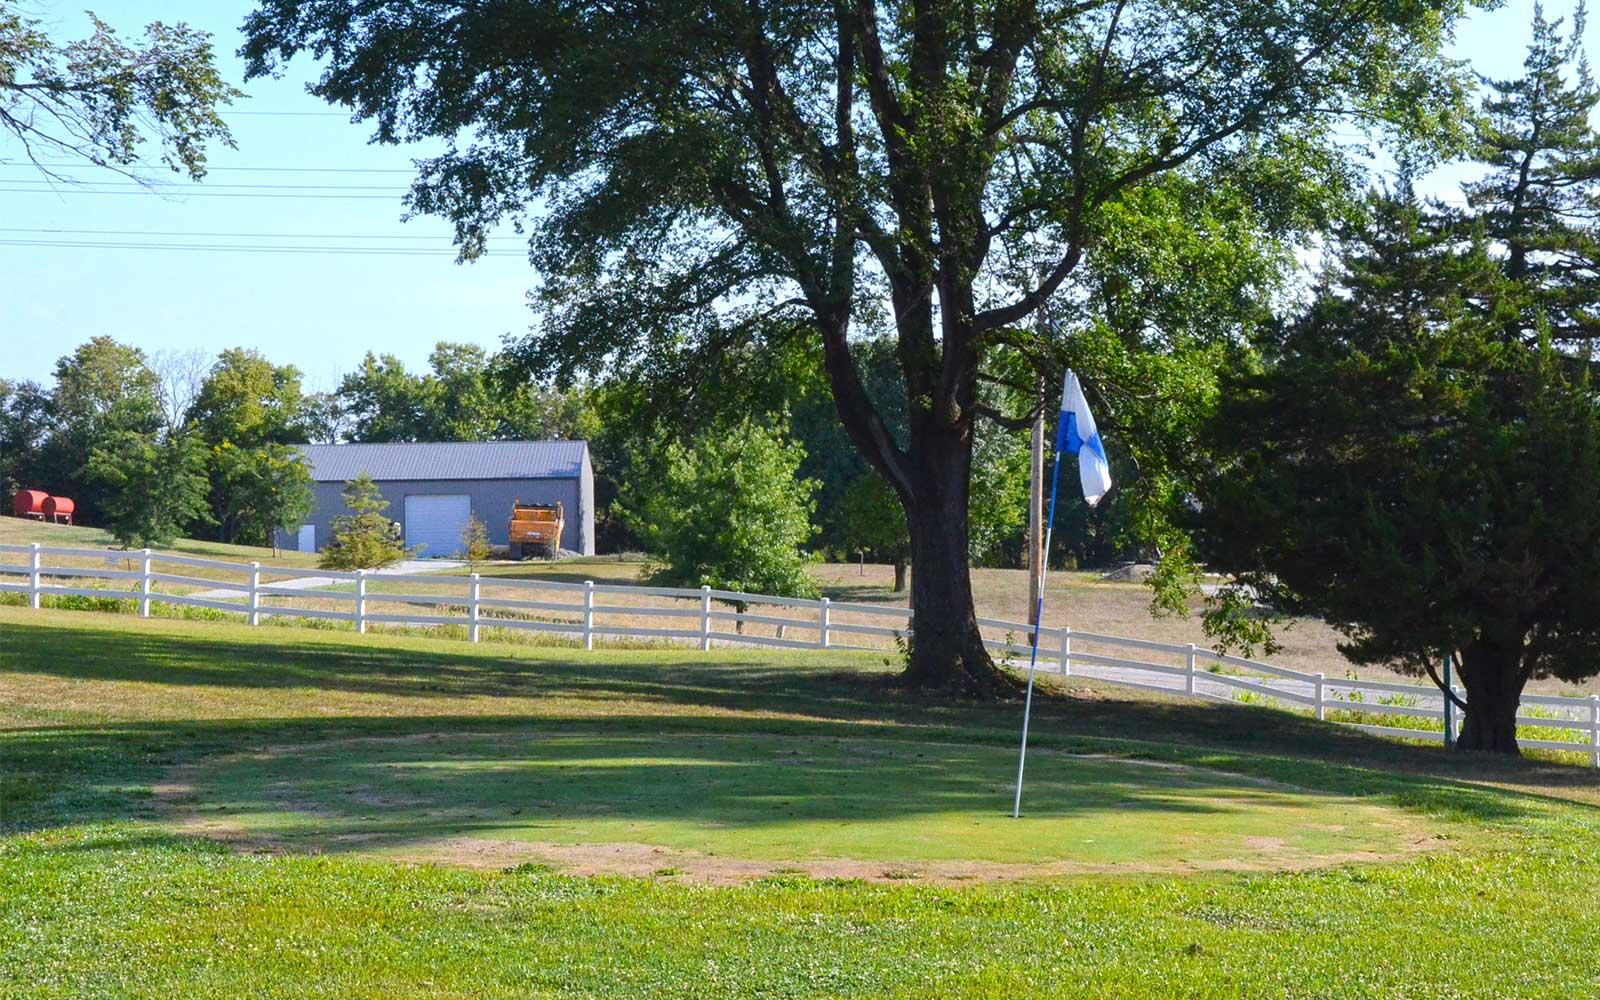 The-Golf-Club-of-St-Joeseph,-St-Joseph,-MO-Fence